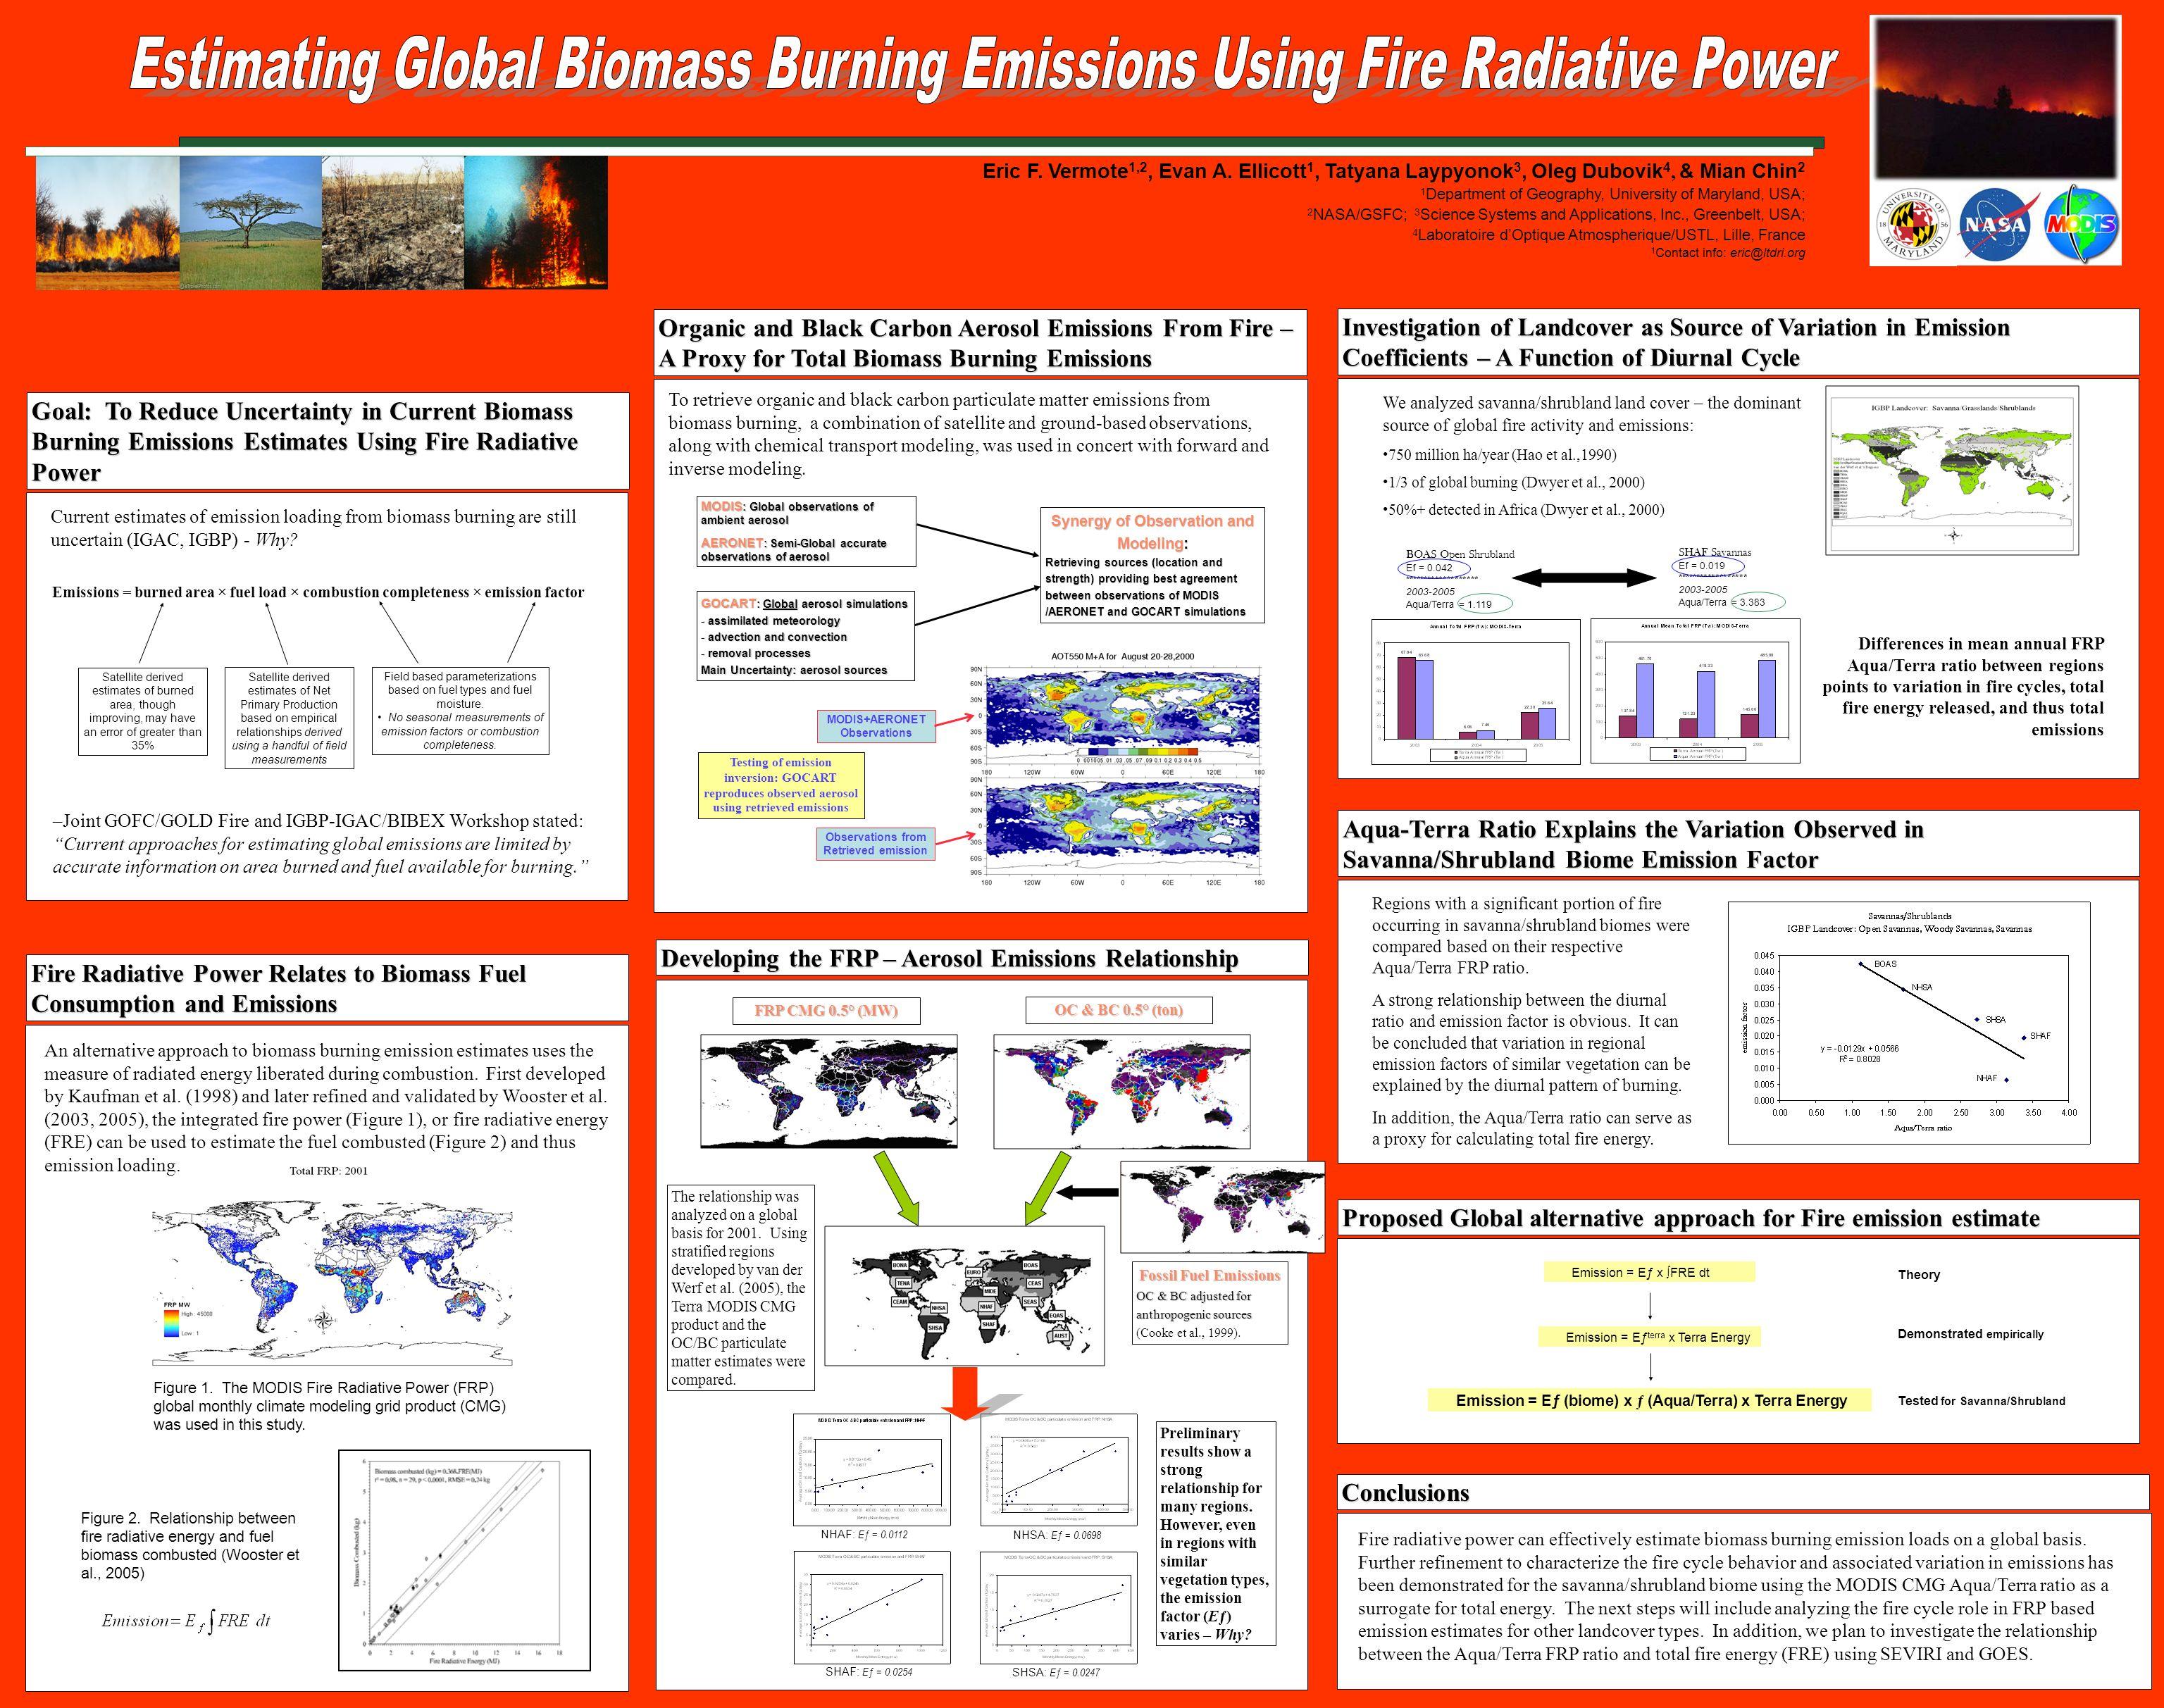 OC & BC 0.5° (ton) Eric F. Vermote 1,2, Evan A. Ellicott 1, Tatyana Laypyonok 3, Oleg Dubovik 4, & Mian Chin 2 1 Department of Geography, University o